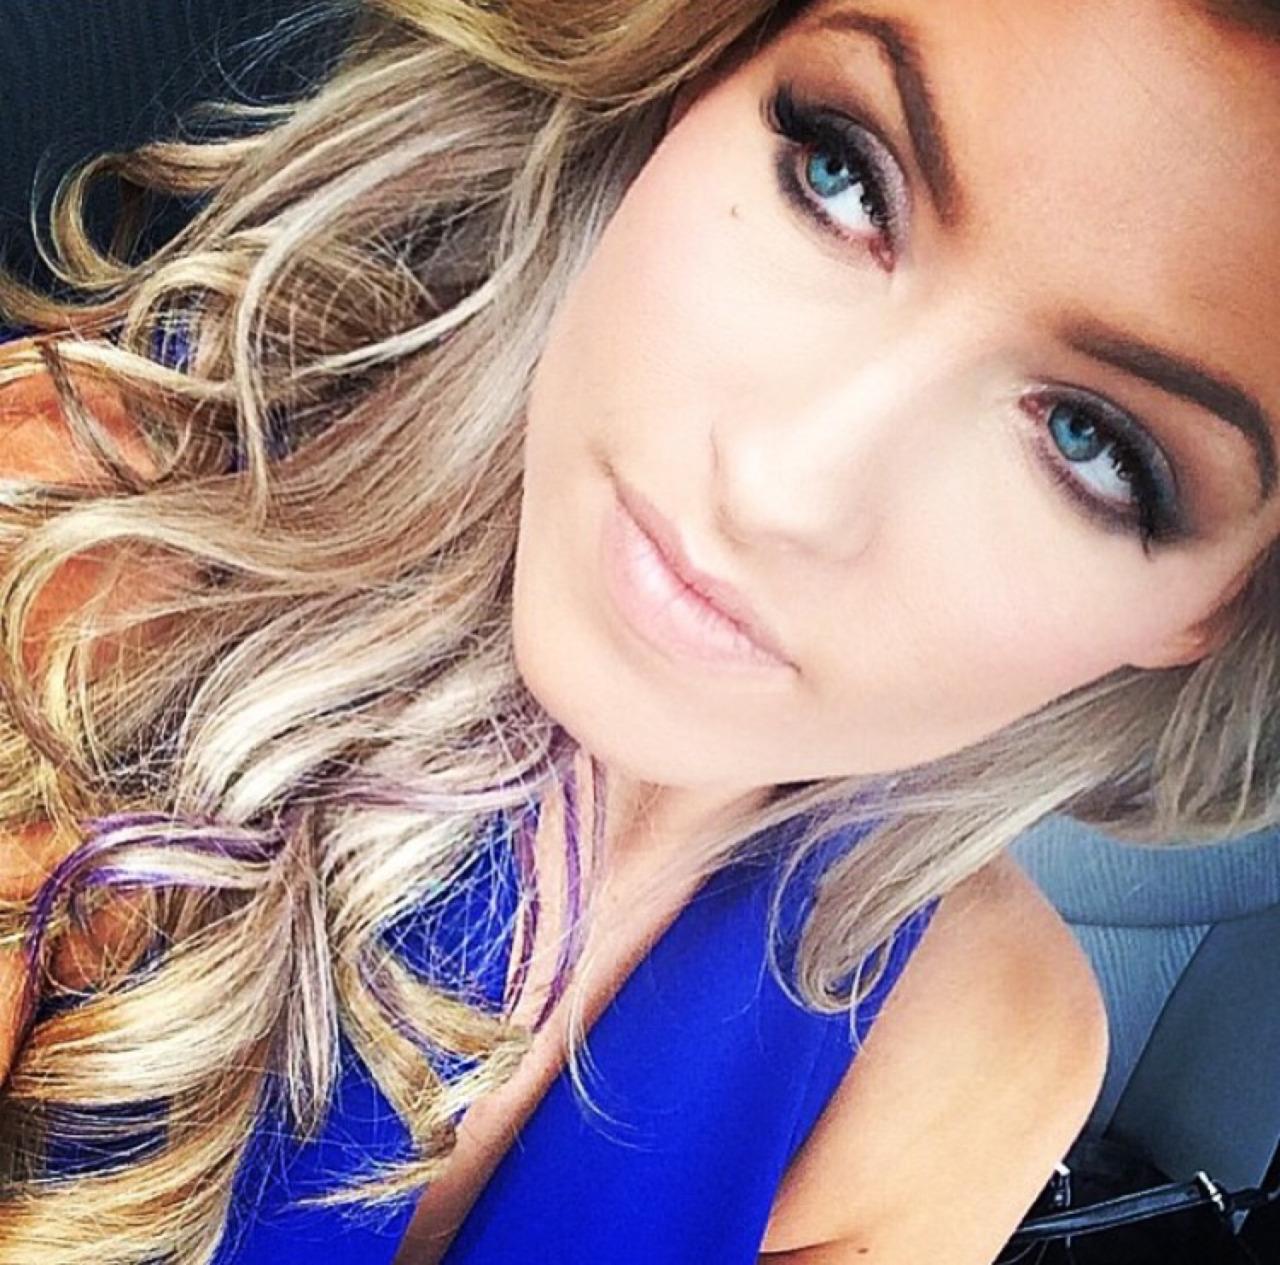 selfie coquin snap de femme hot et sexy du 29